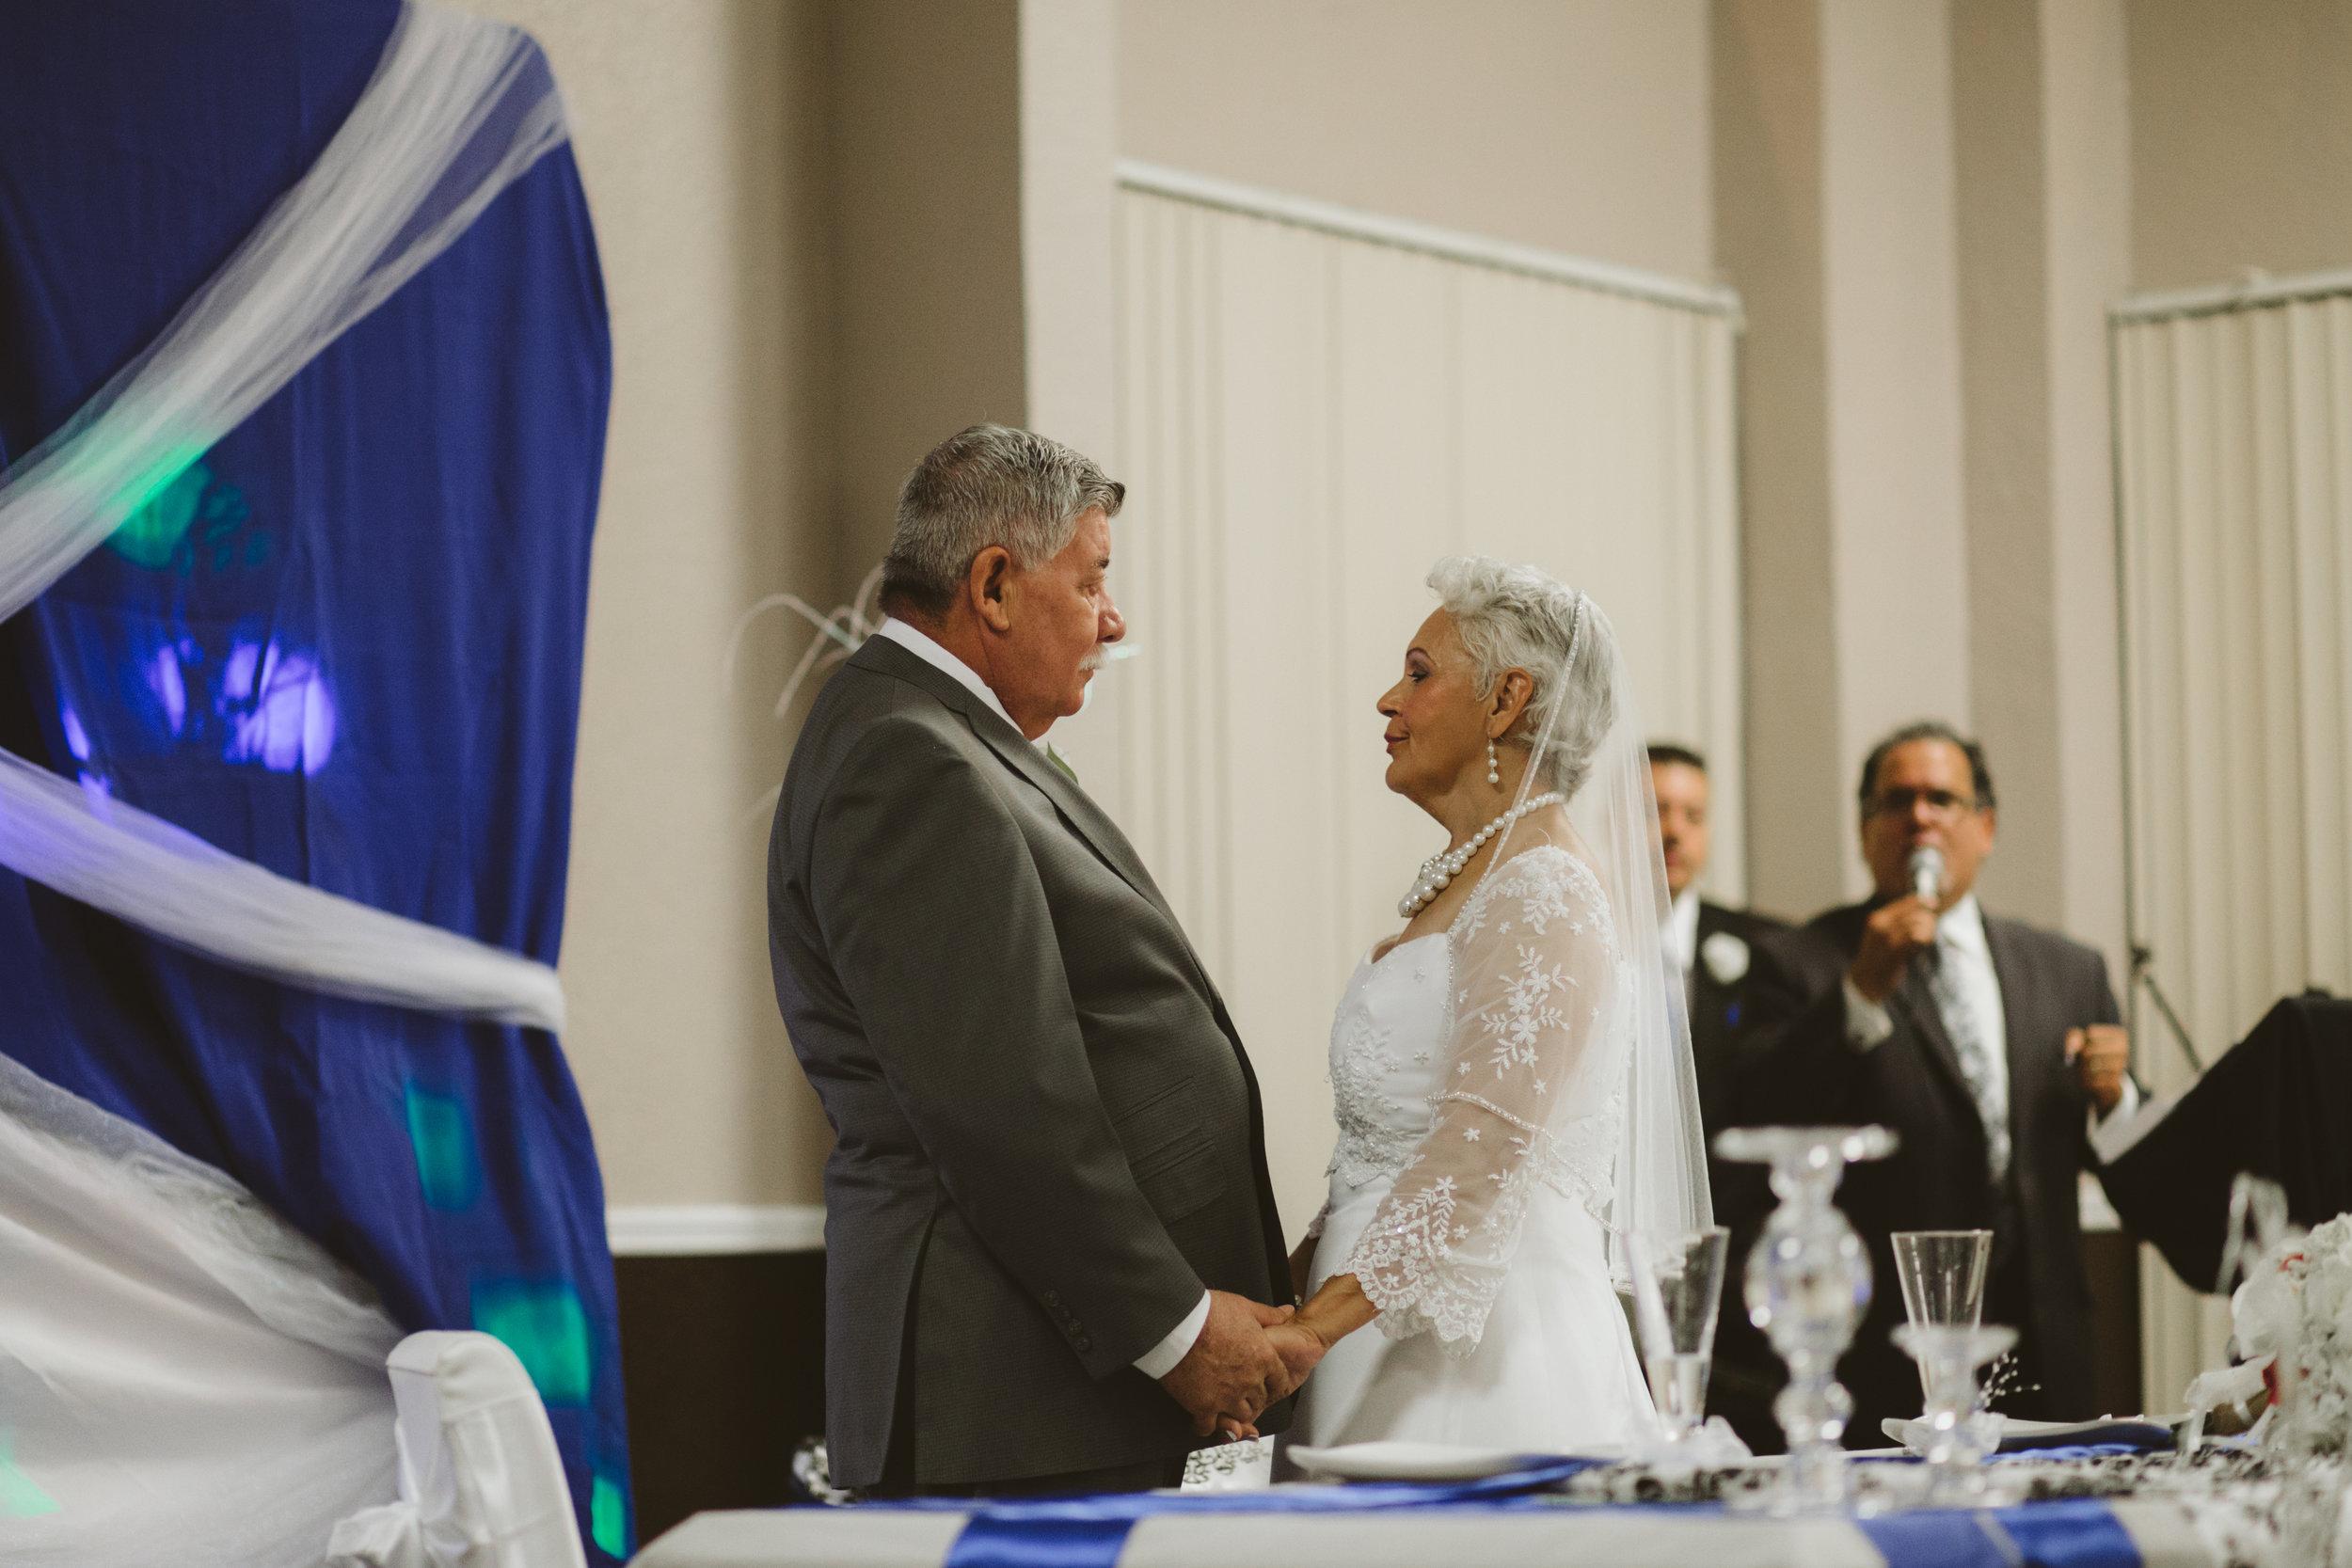 wedding | Vanessa Boy Photography | vanessaboy.com |-303.jpg